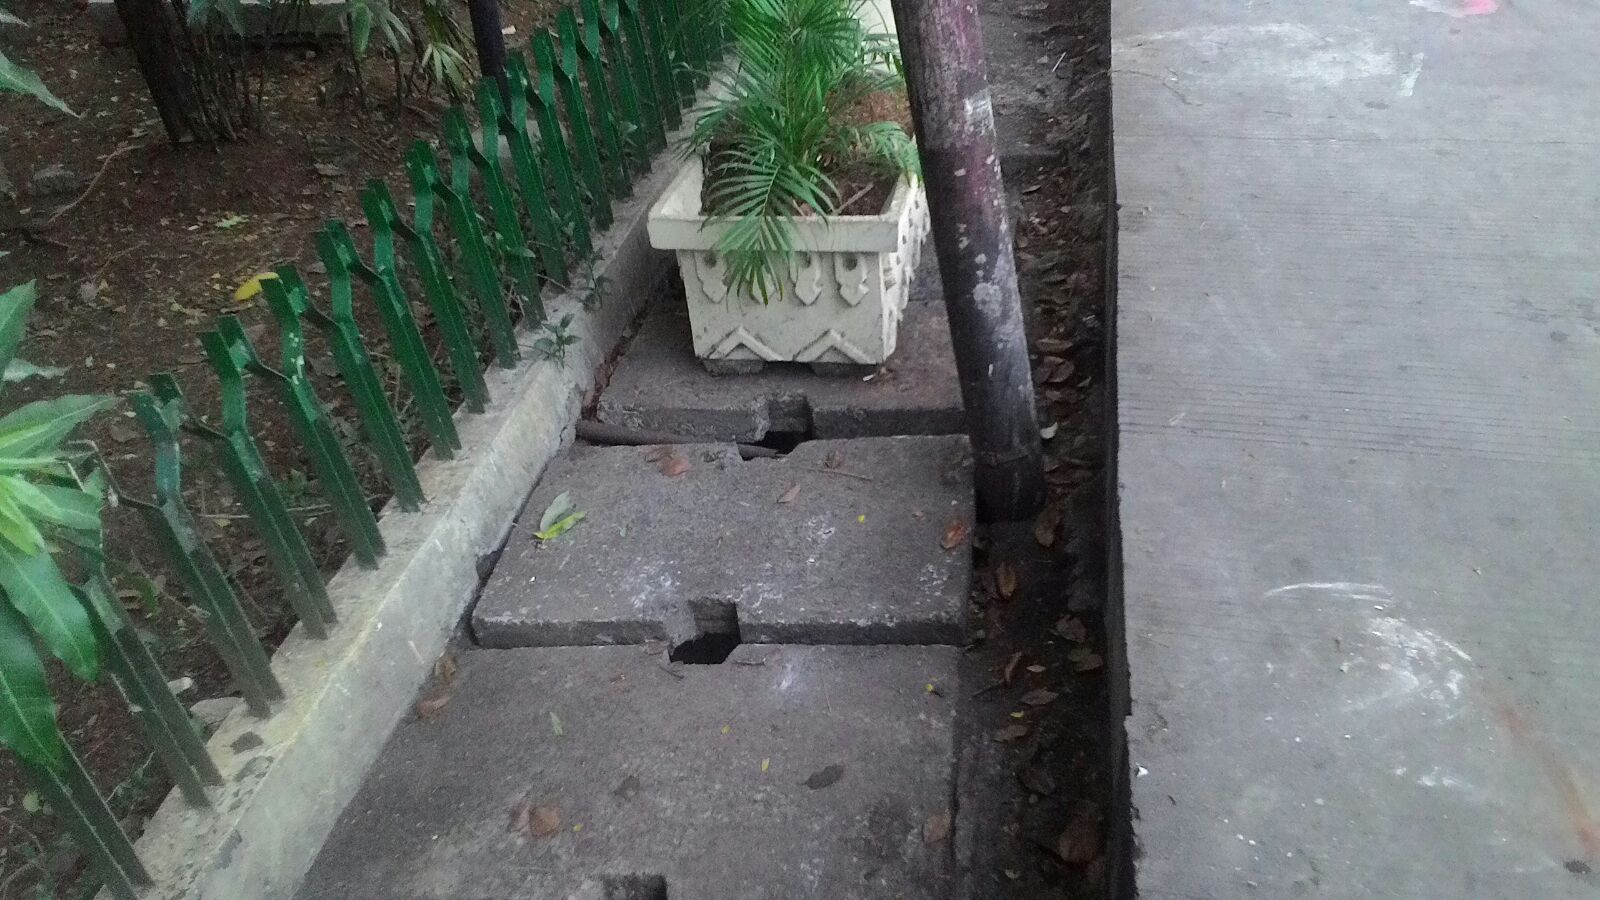 Pemprov DKI Sekadarnya Saja Membersihkan Saluran Air di Kemayoran